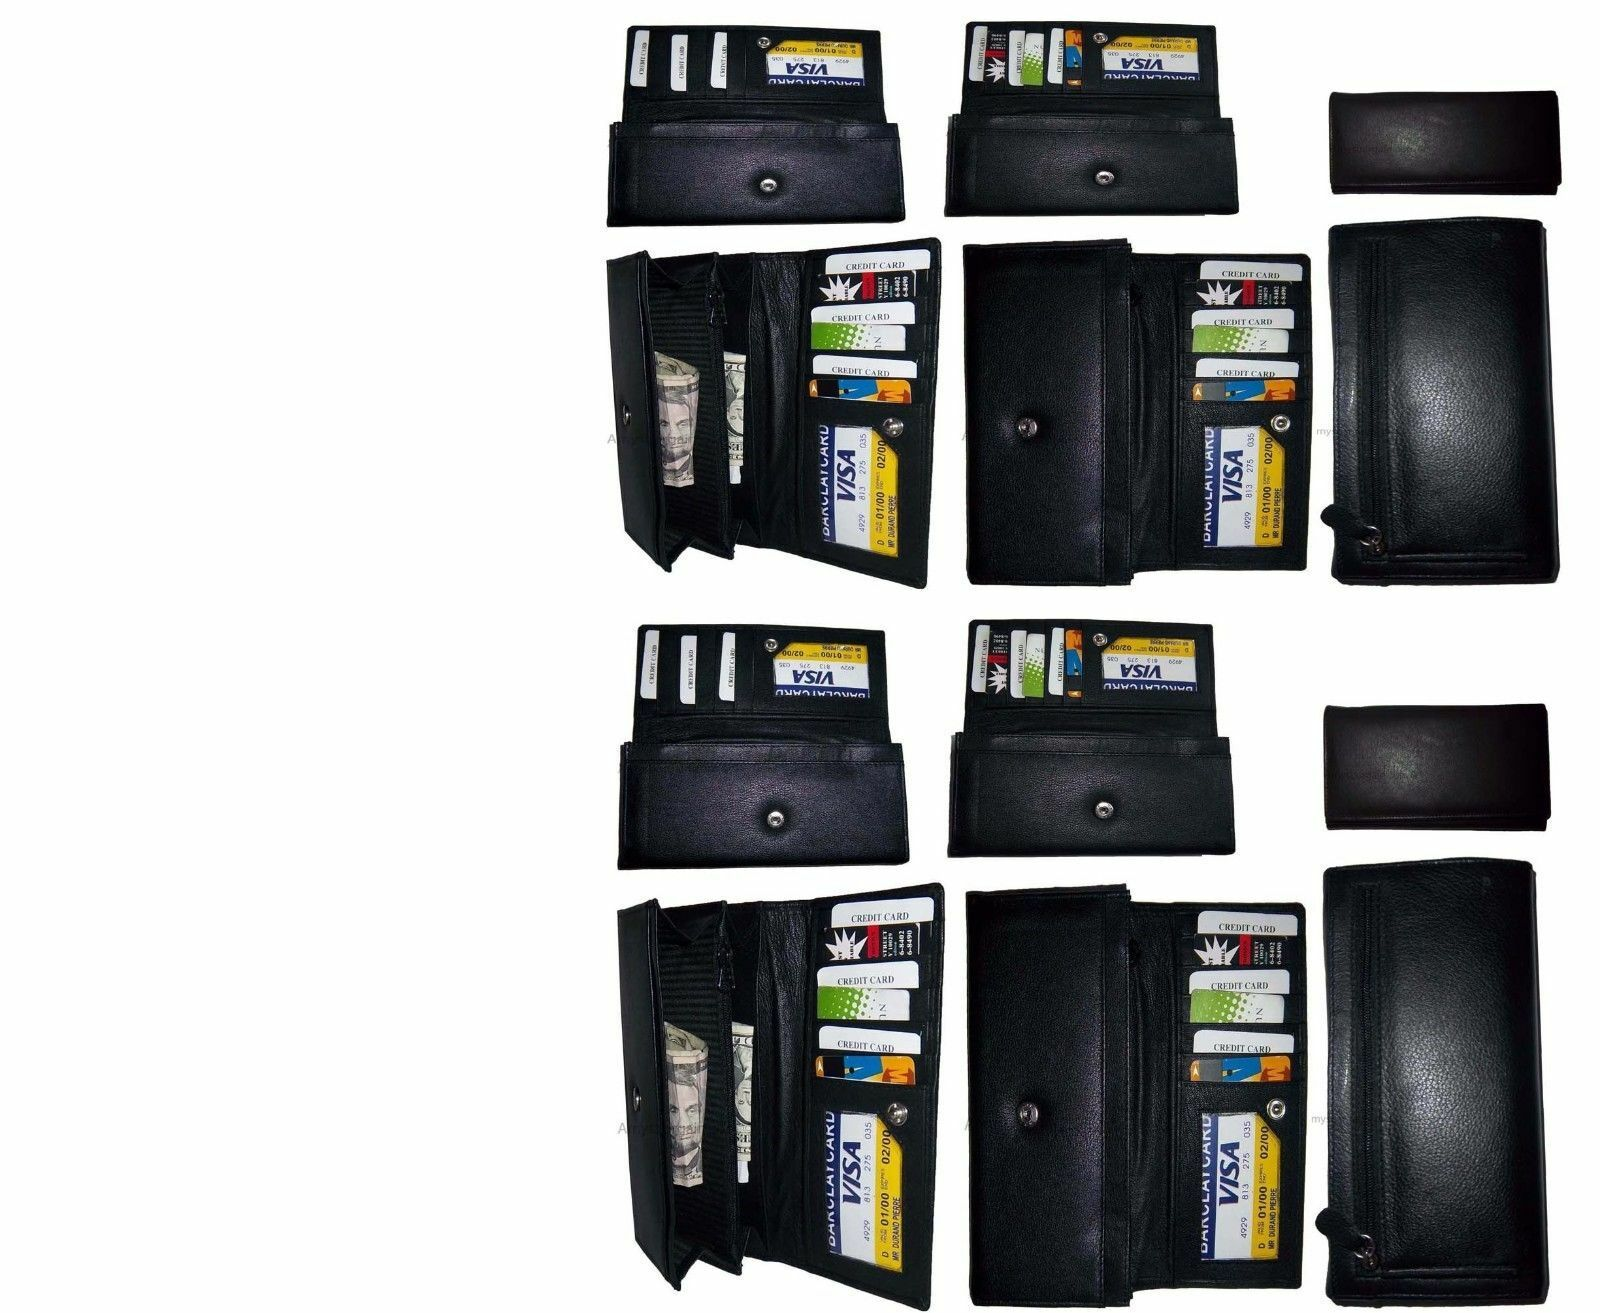 Lot of 12 New Women's checkbook wallet, Black leather Ladies checkbook wallet BN